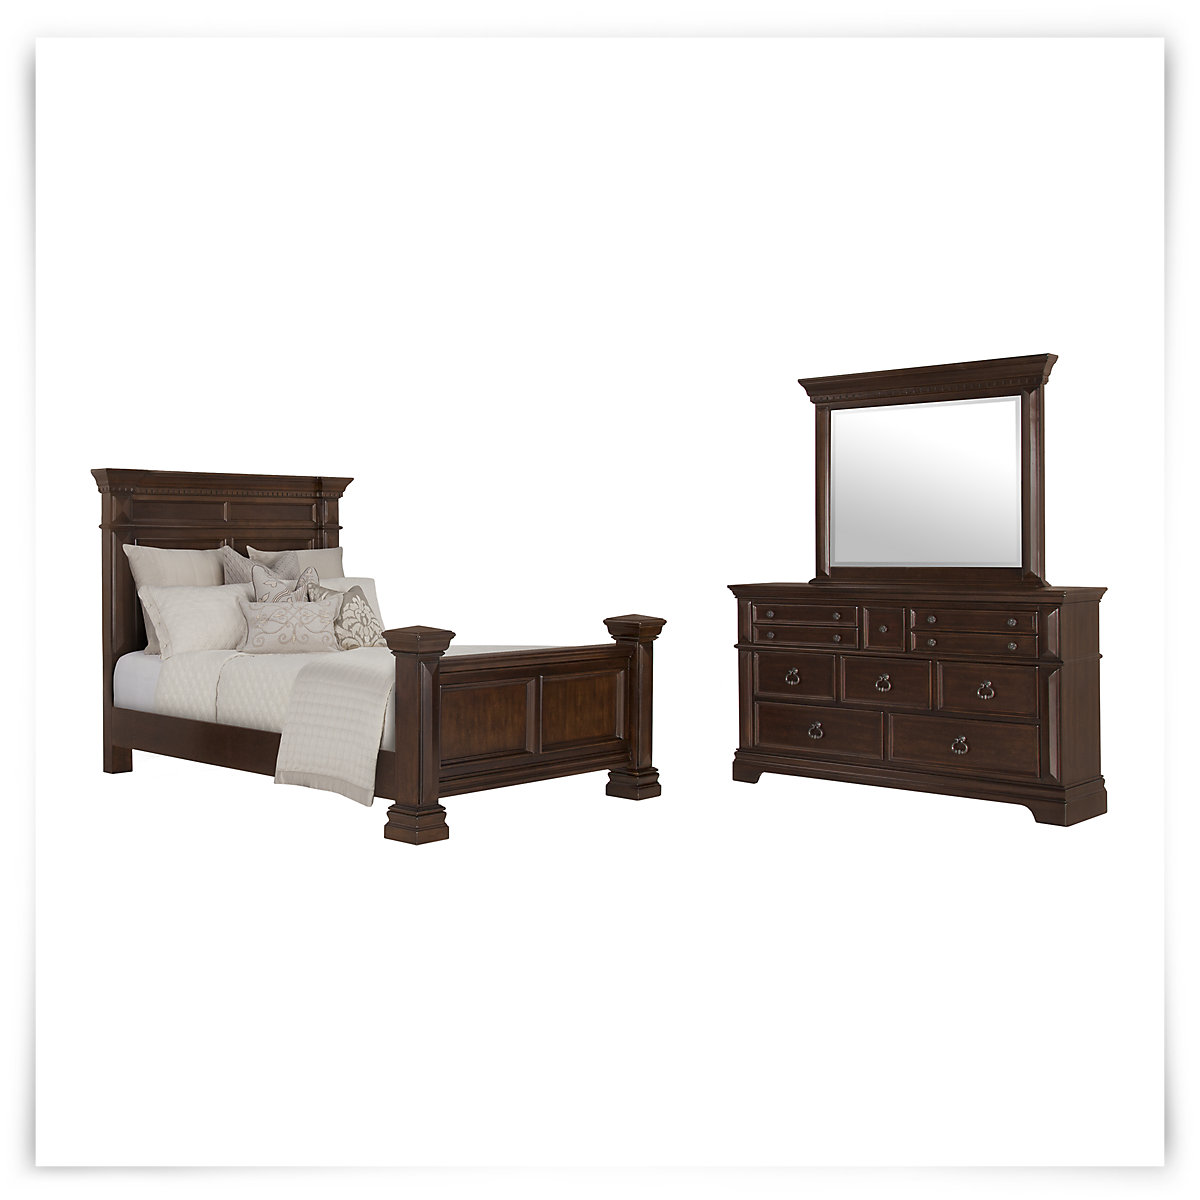 City furniture essex dark tone panel bedroom for Bedroom furniture essex